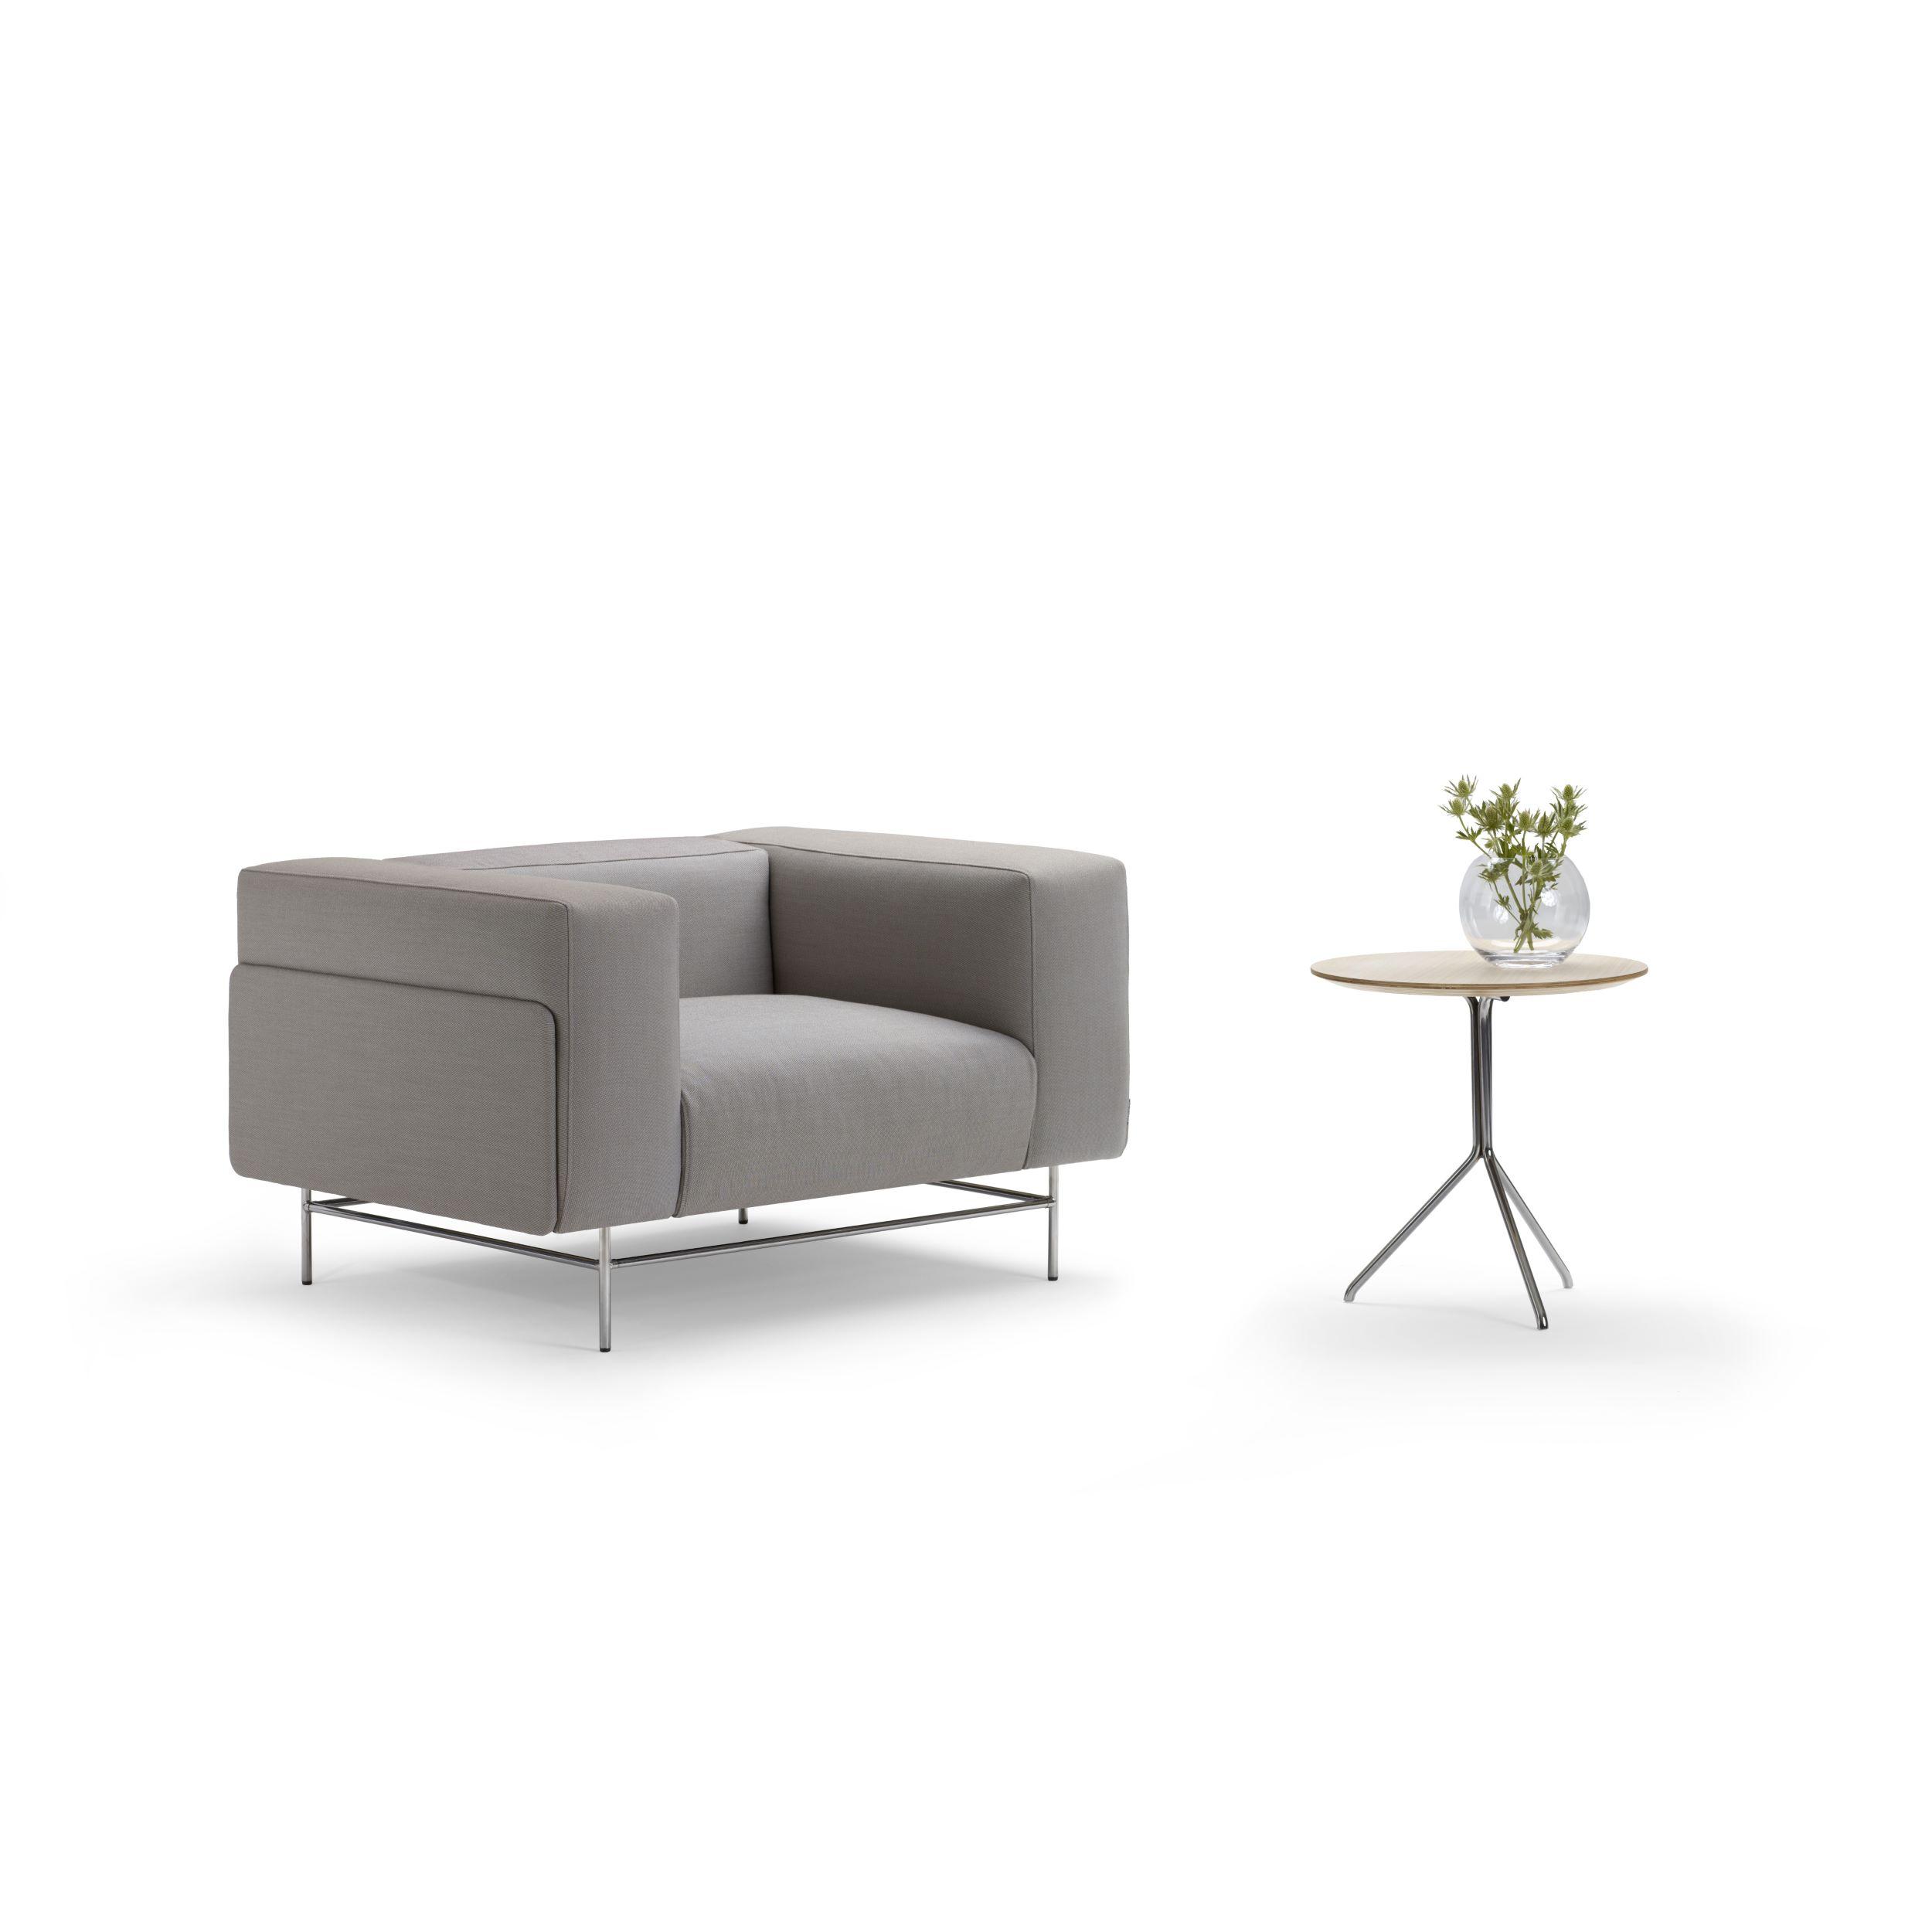 avignon f t lj offecct. Black Bedroom Furniture Sets. Home Design Ideas